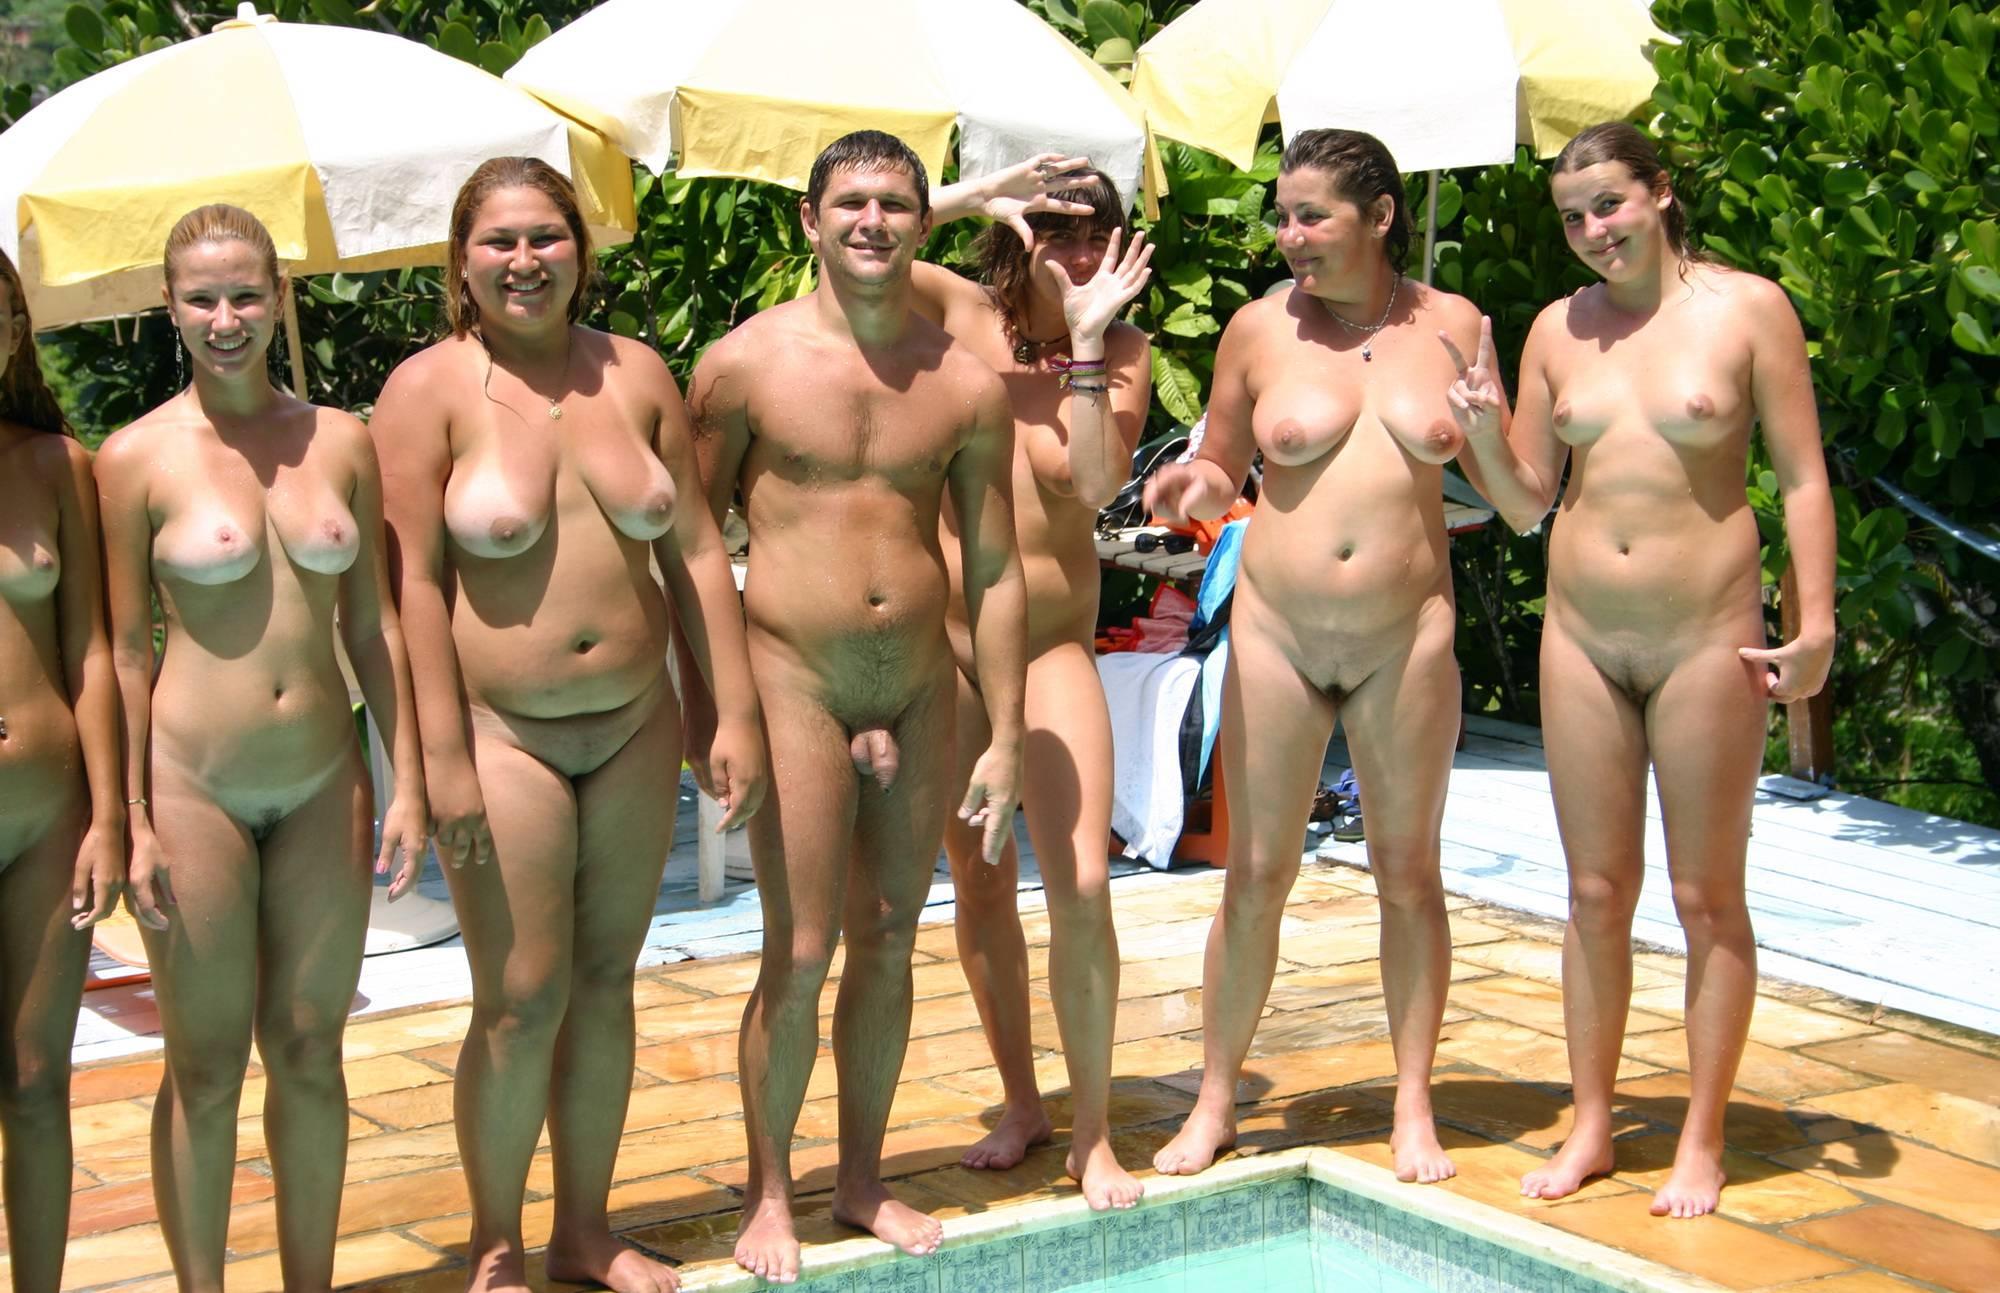 Purenudism Images-Brazilian Pool Line Up One - 1